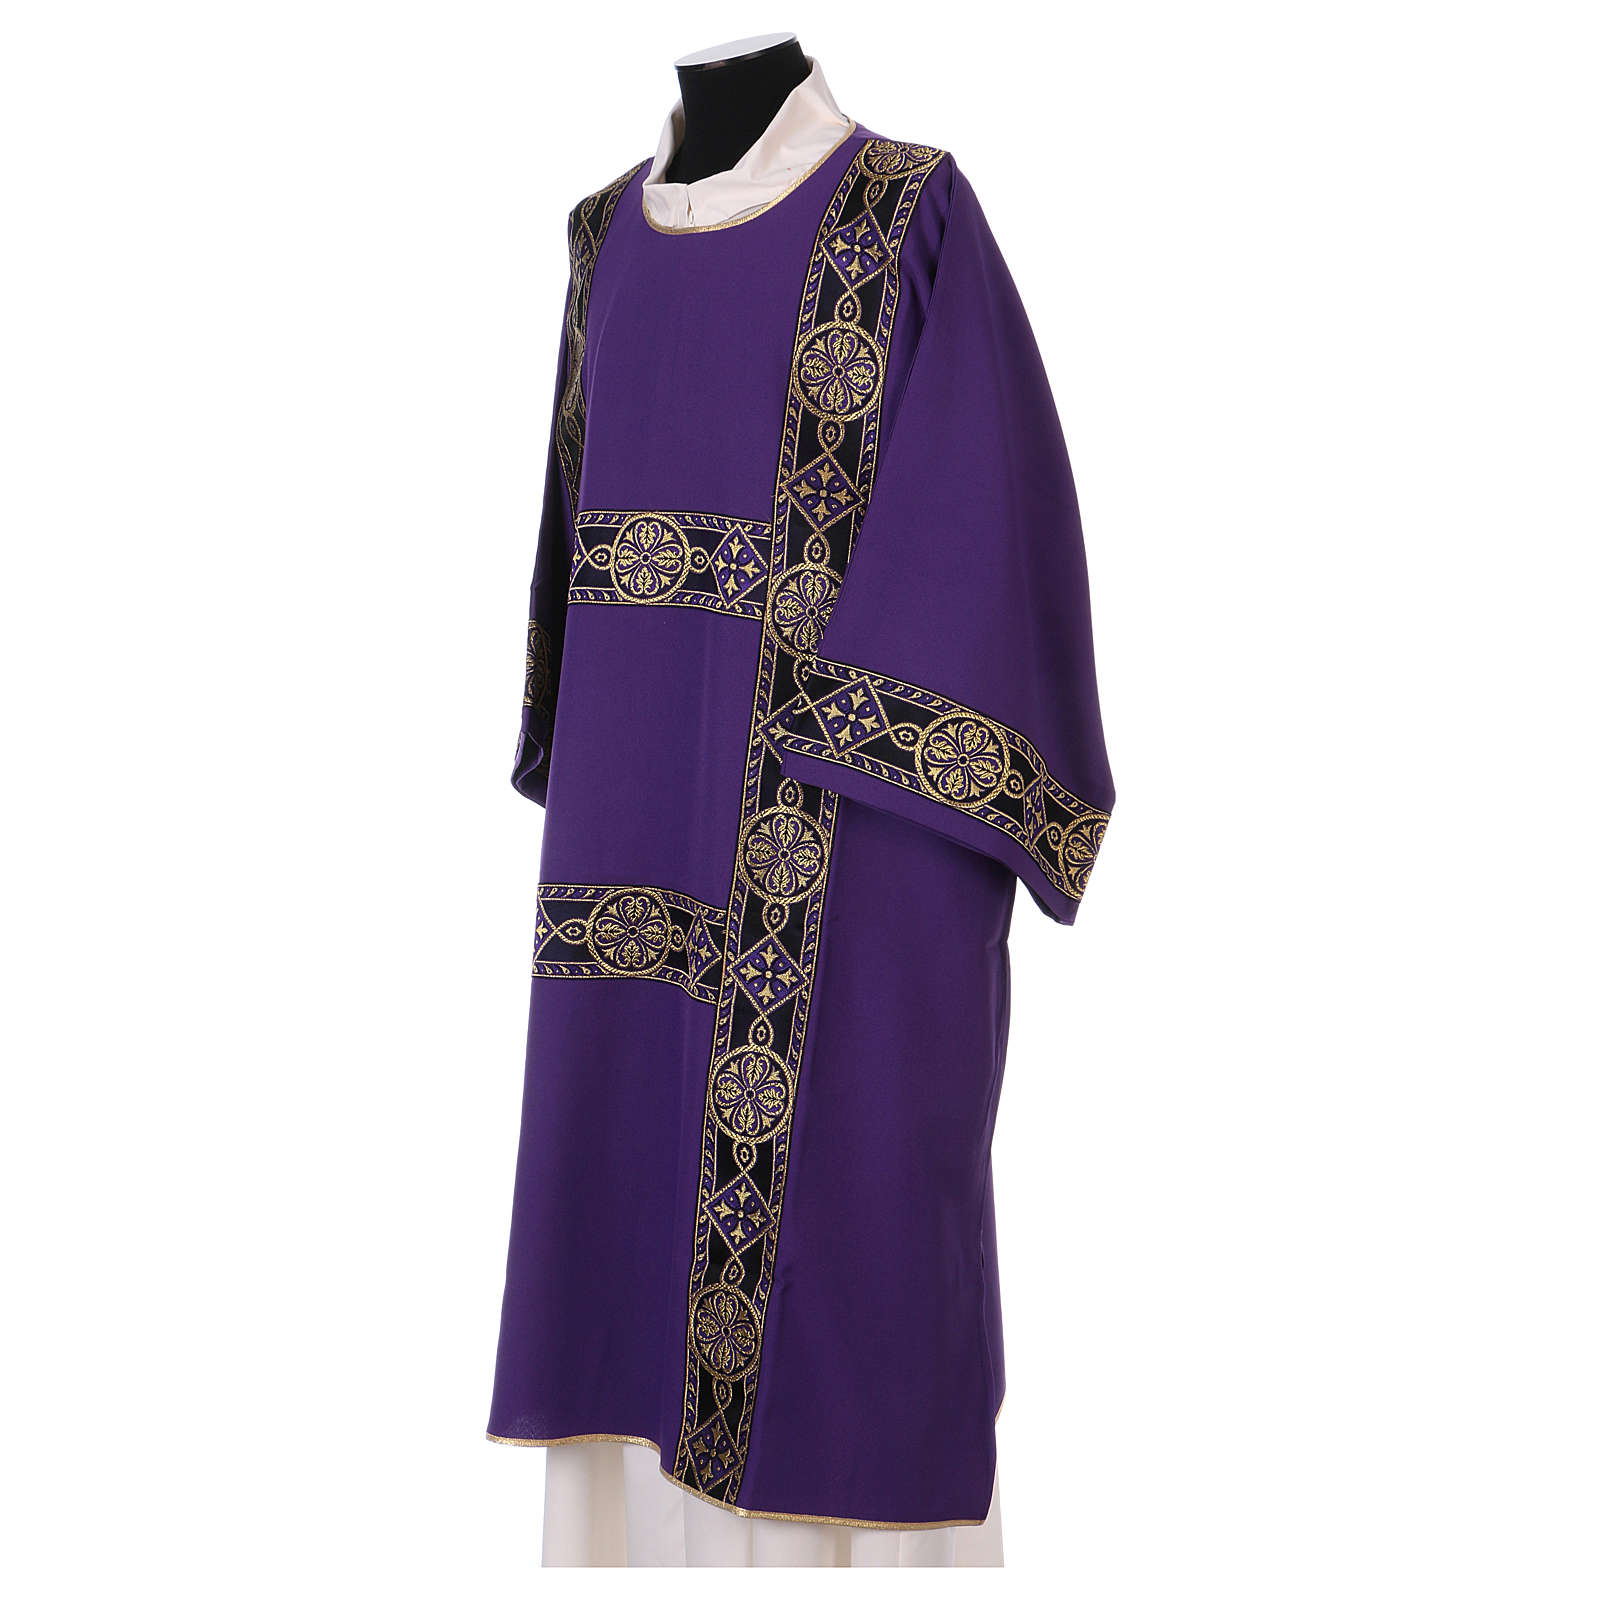 Dalmatique bande appliquée avant tissu Vatican 100% polyester 4